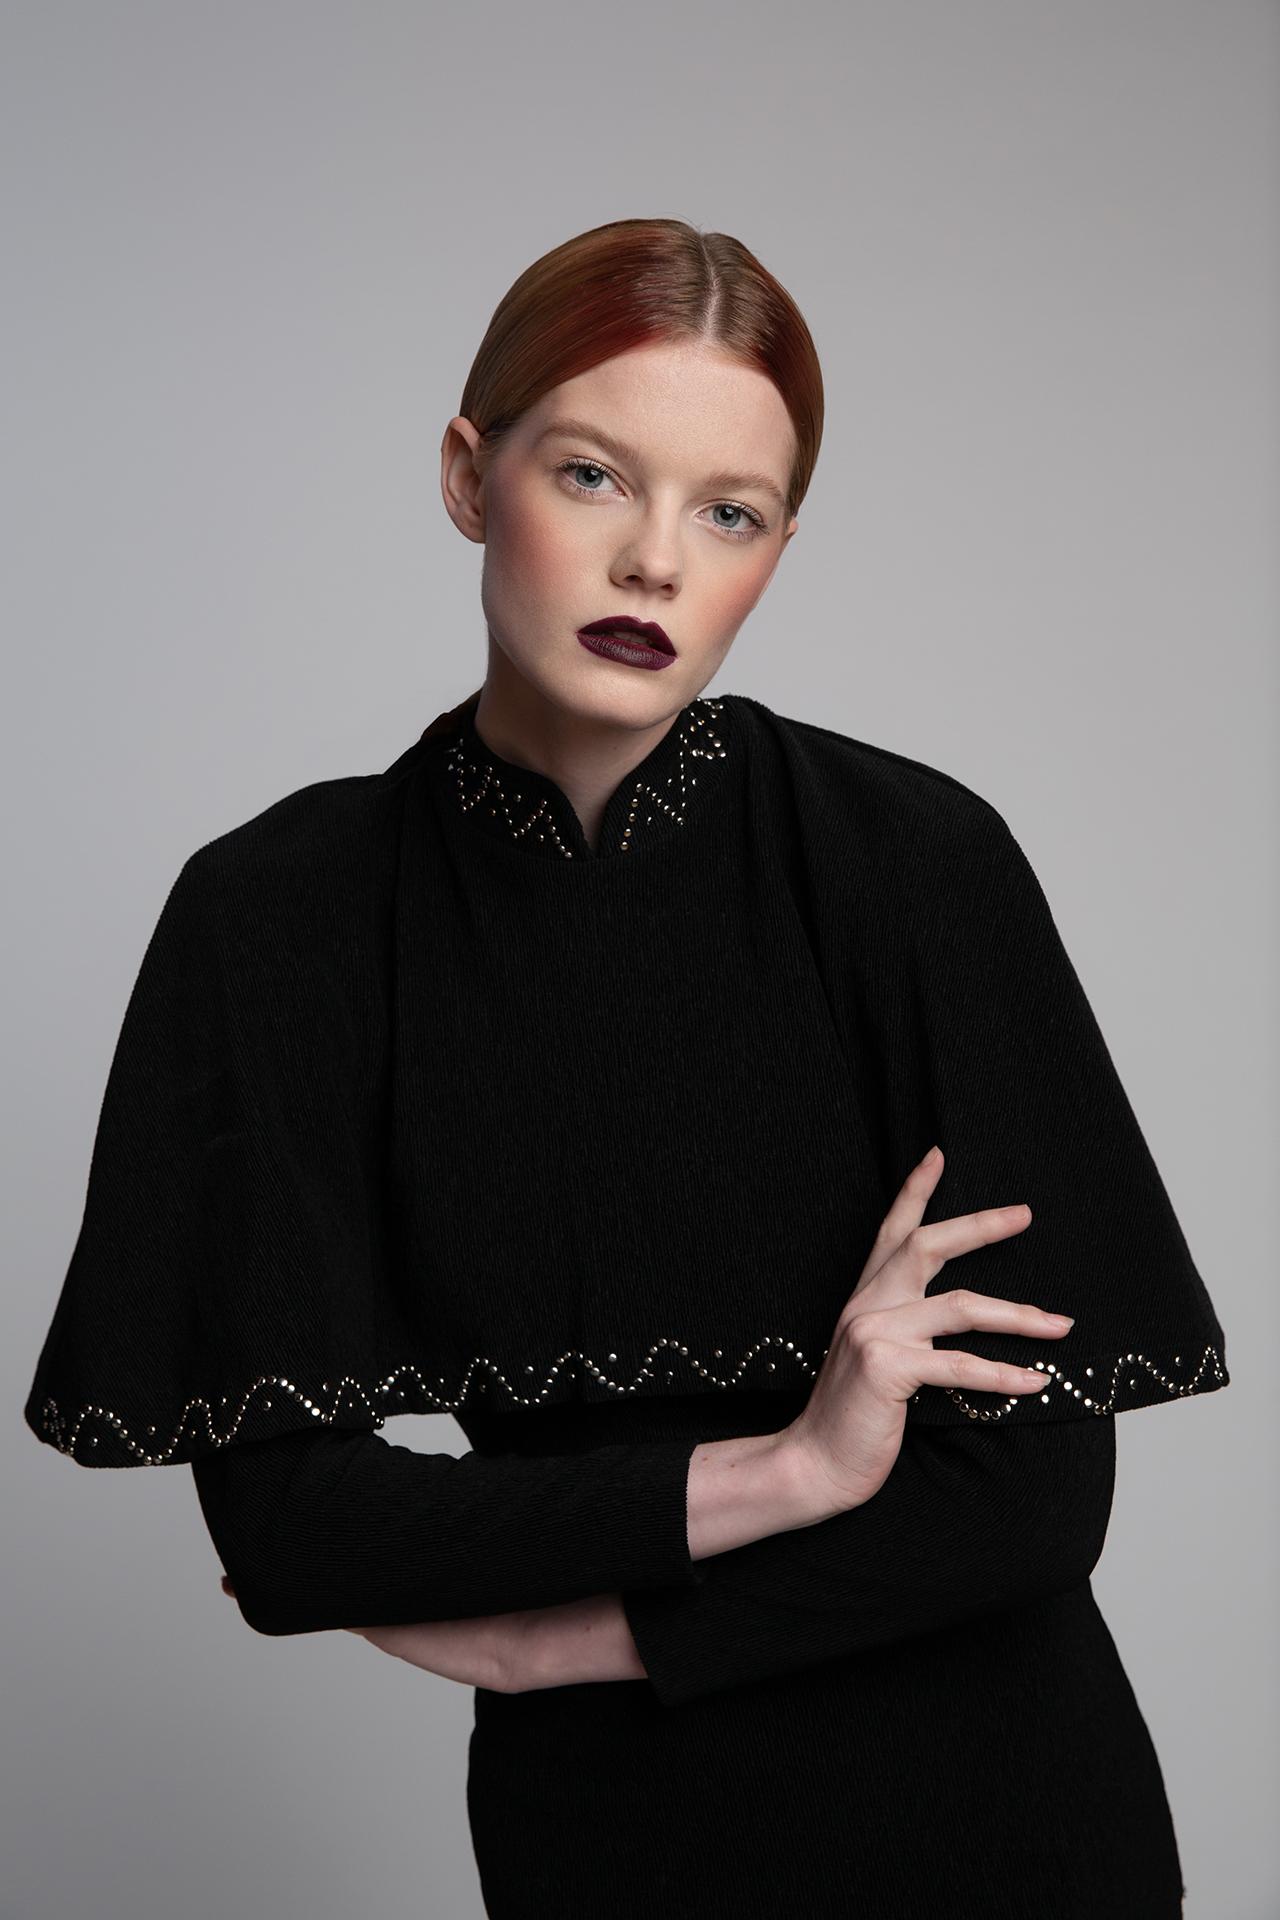 mark_and_naomi_toronto_fashion_photography_david_dunkley_black_tie_viii.jpg